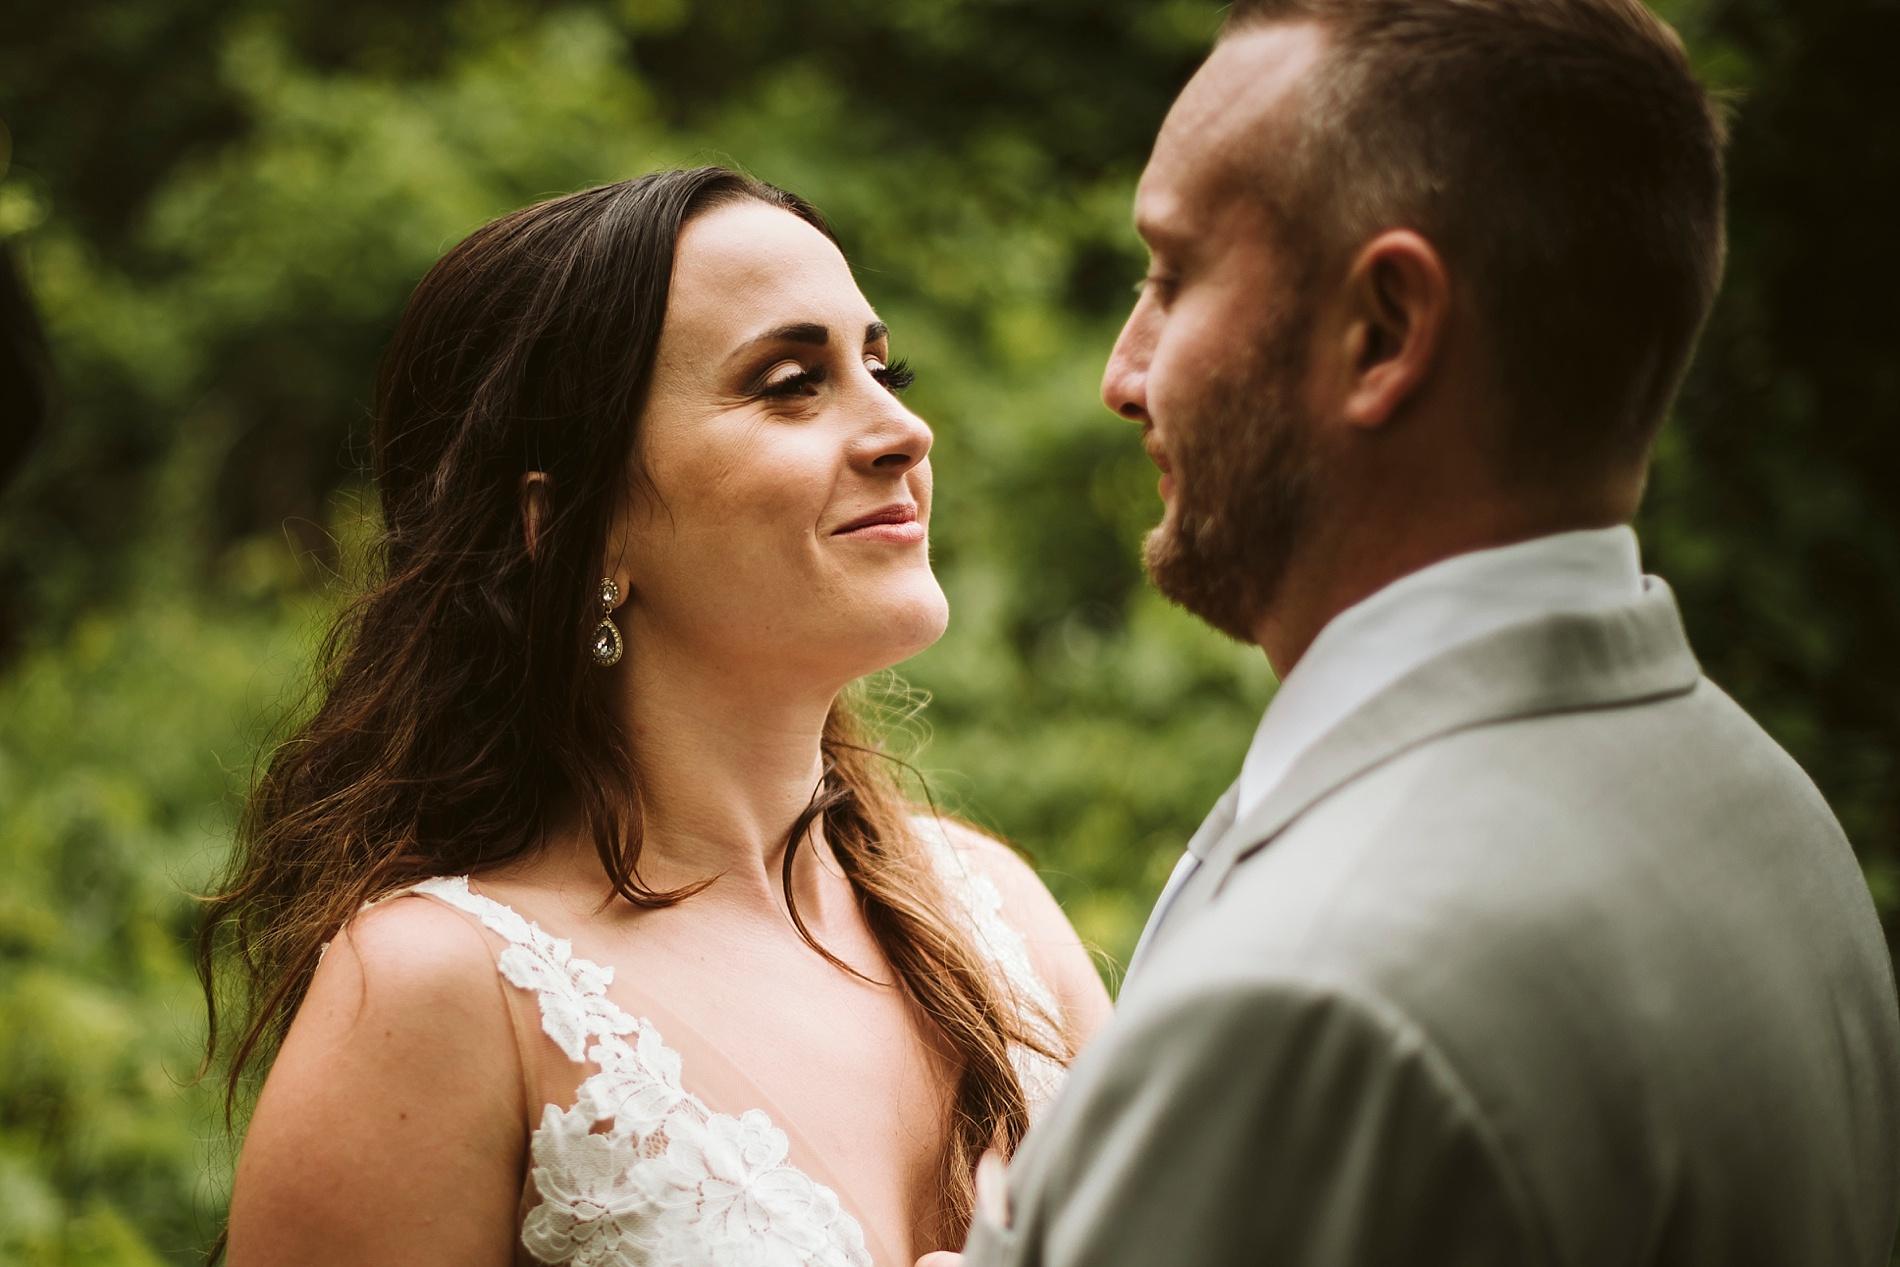 Kawartha_Lakes_Wedding_Bobcageon_Eganridge_Resort_Toronto_Photographer_0061.jpg